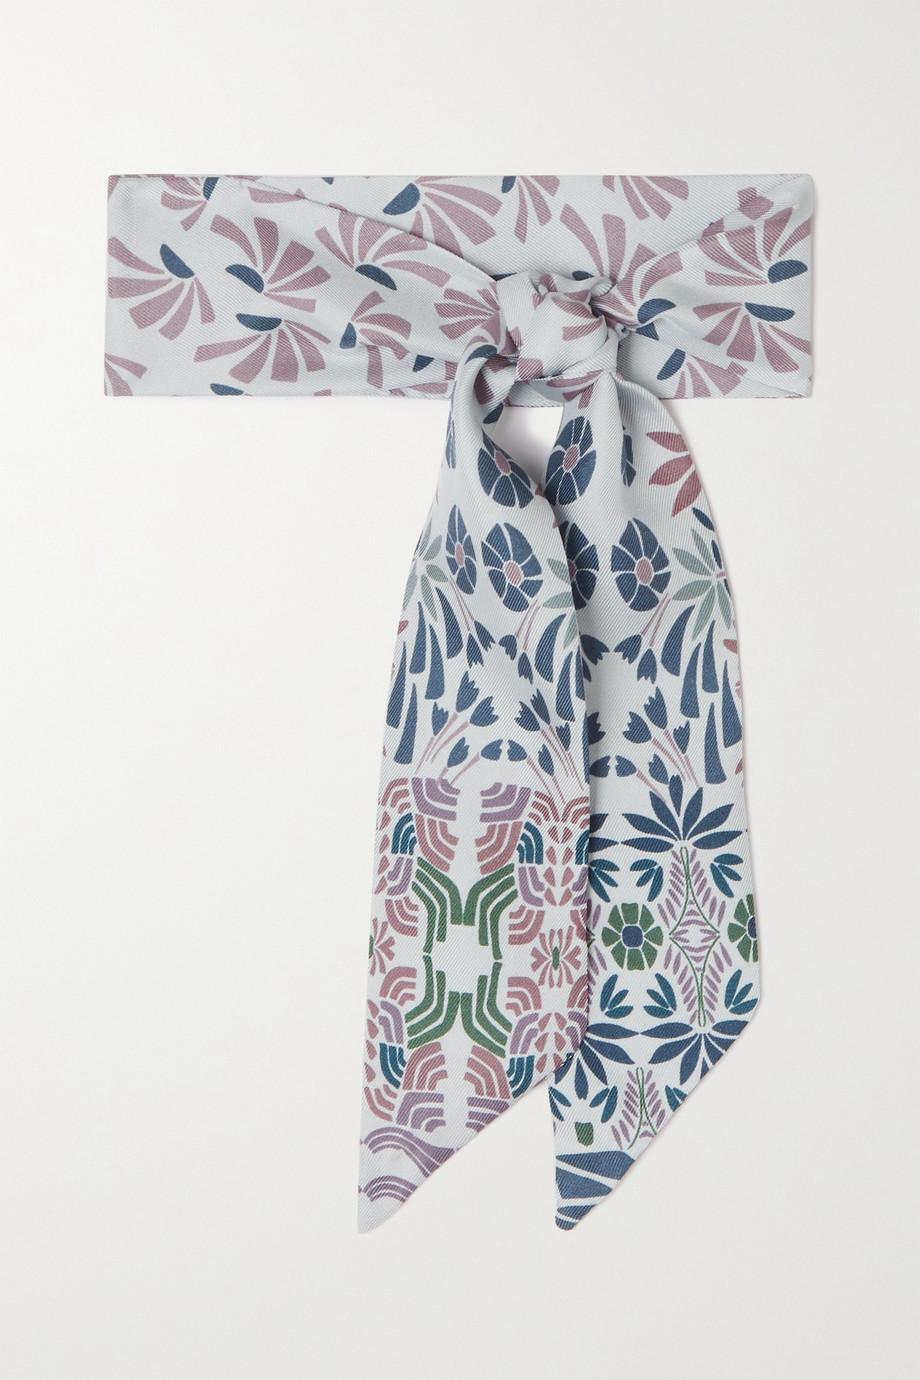 Loro Piana Tuch aus Seiden-Twill mit Blumenprint